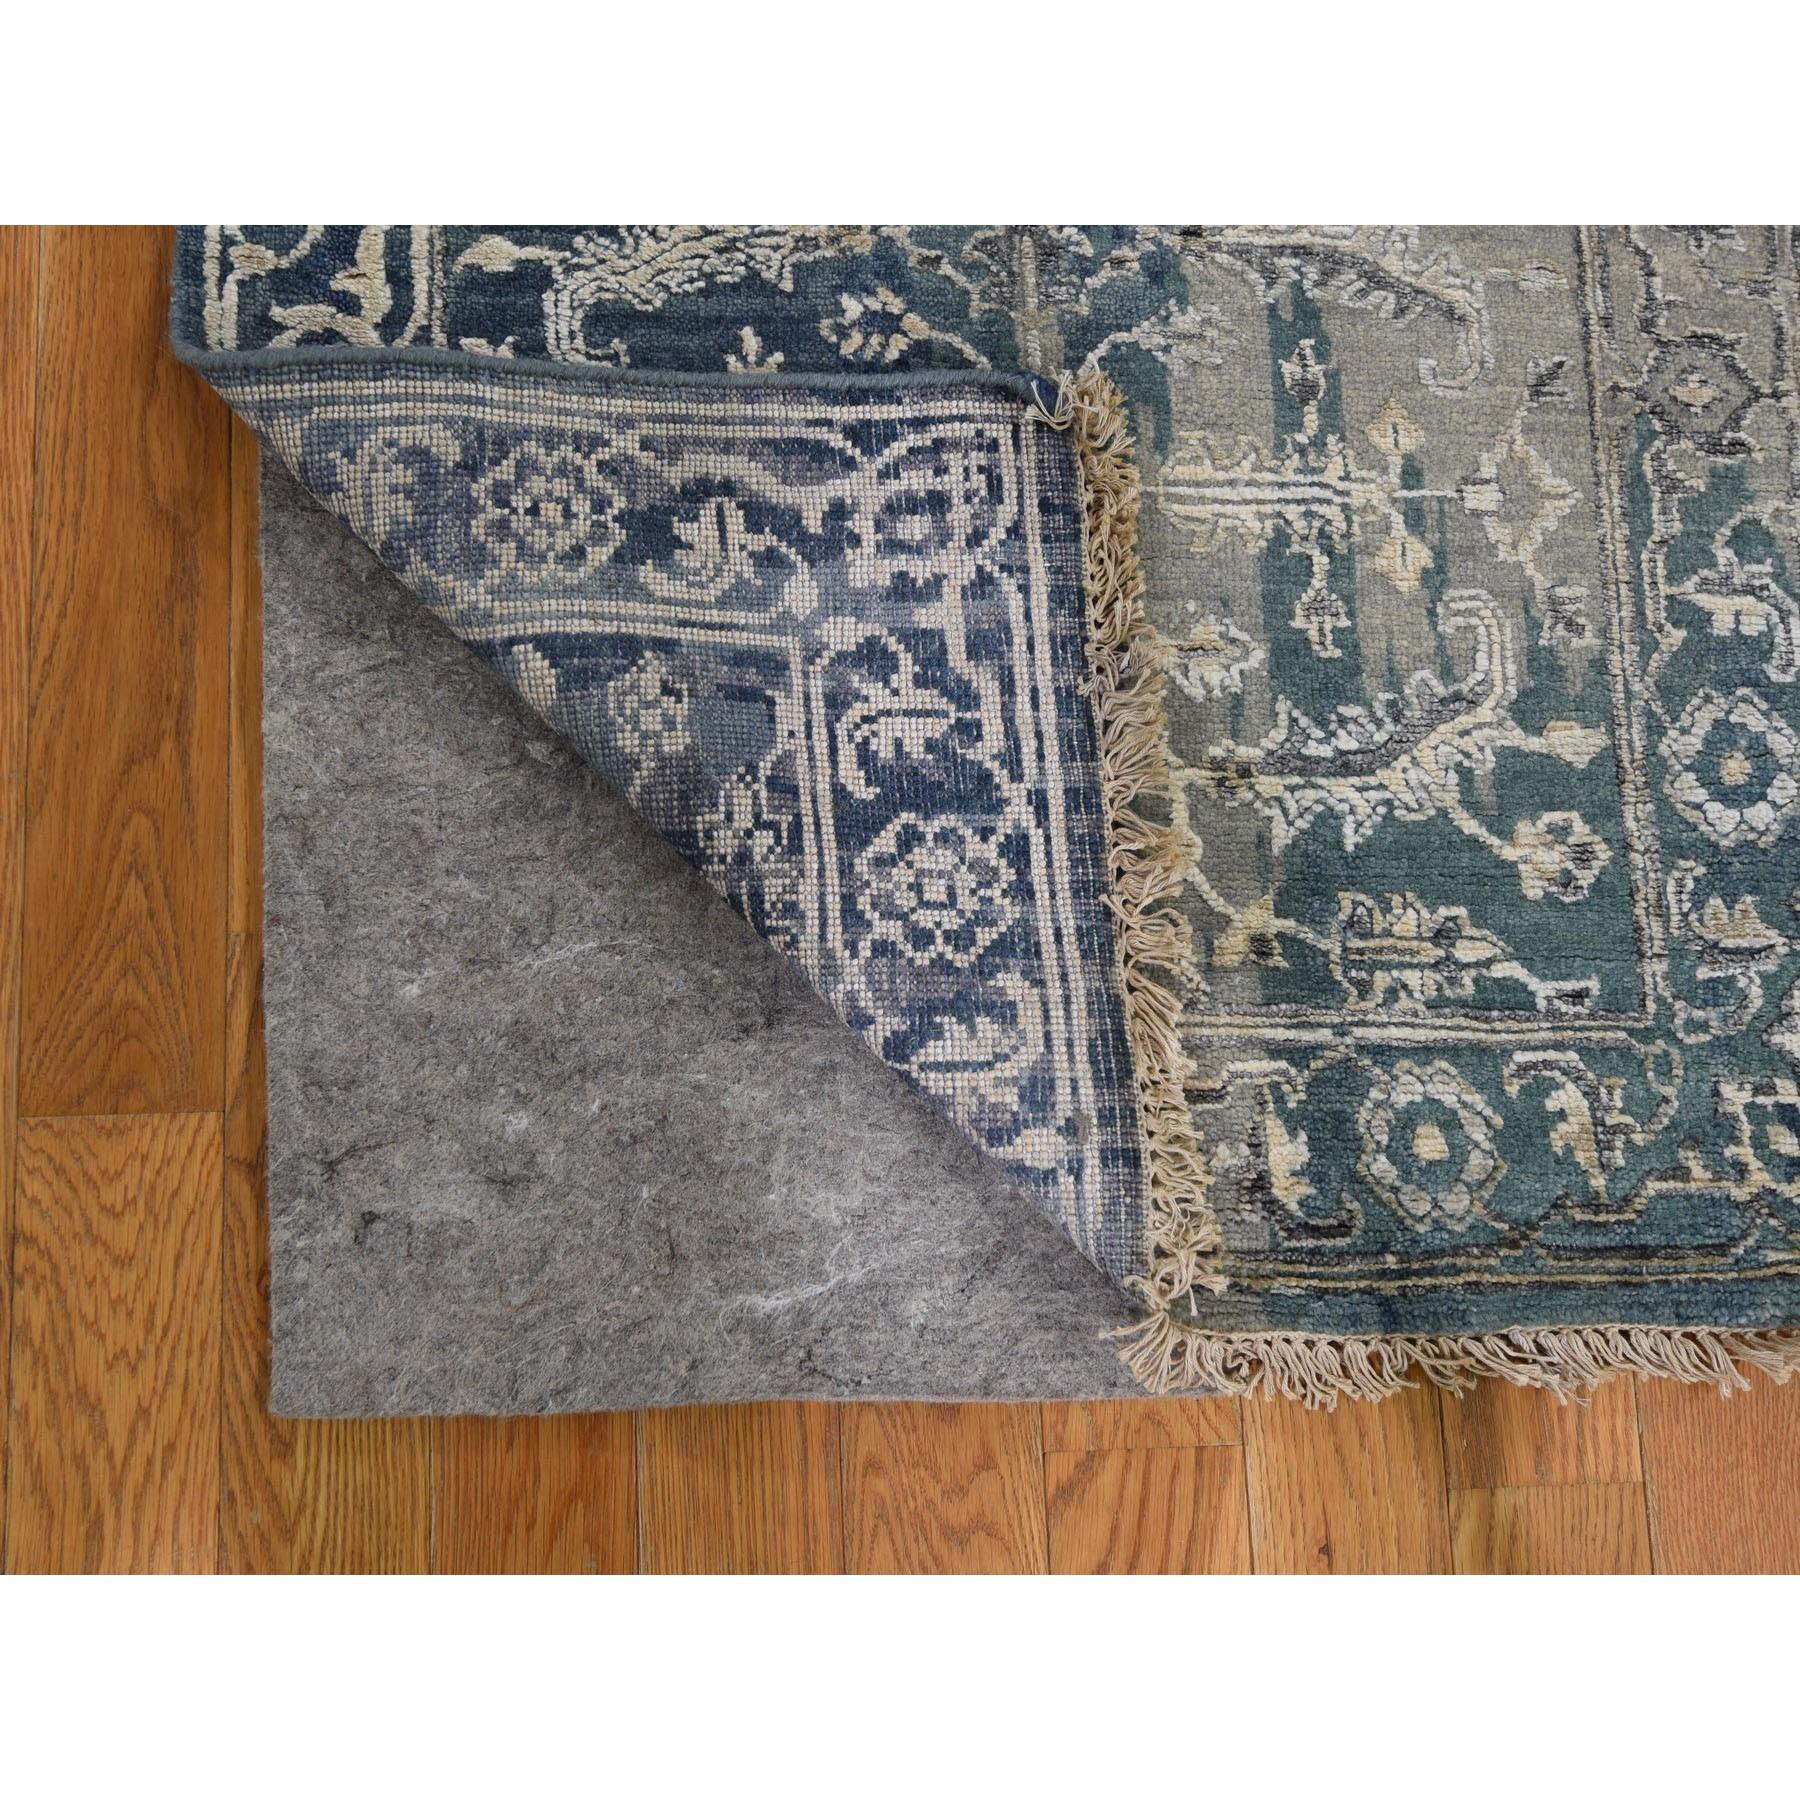 "2'6""x9'9"" Broken Persian Heriz All Over Design Wool And Silk Runner Hand Knotted Oriental Rug"